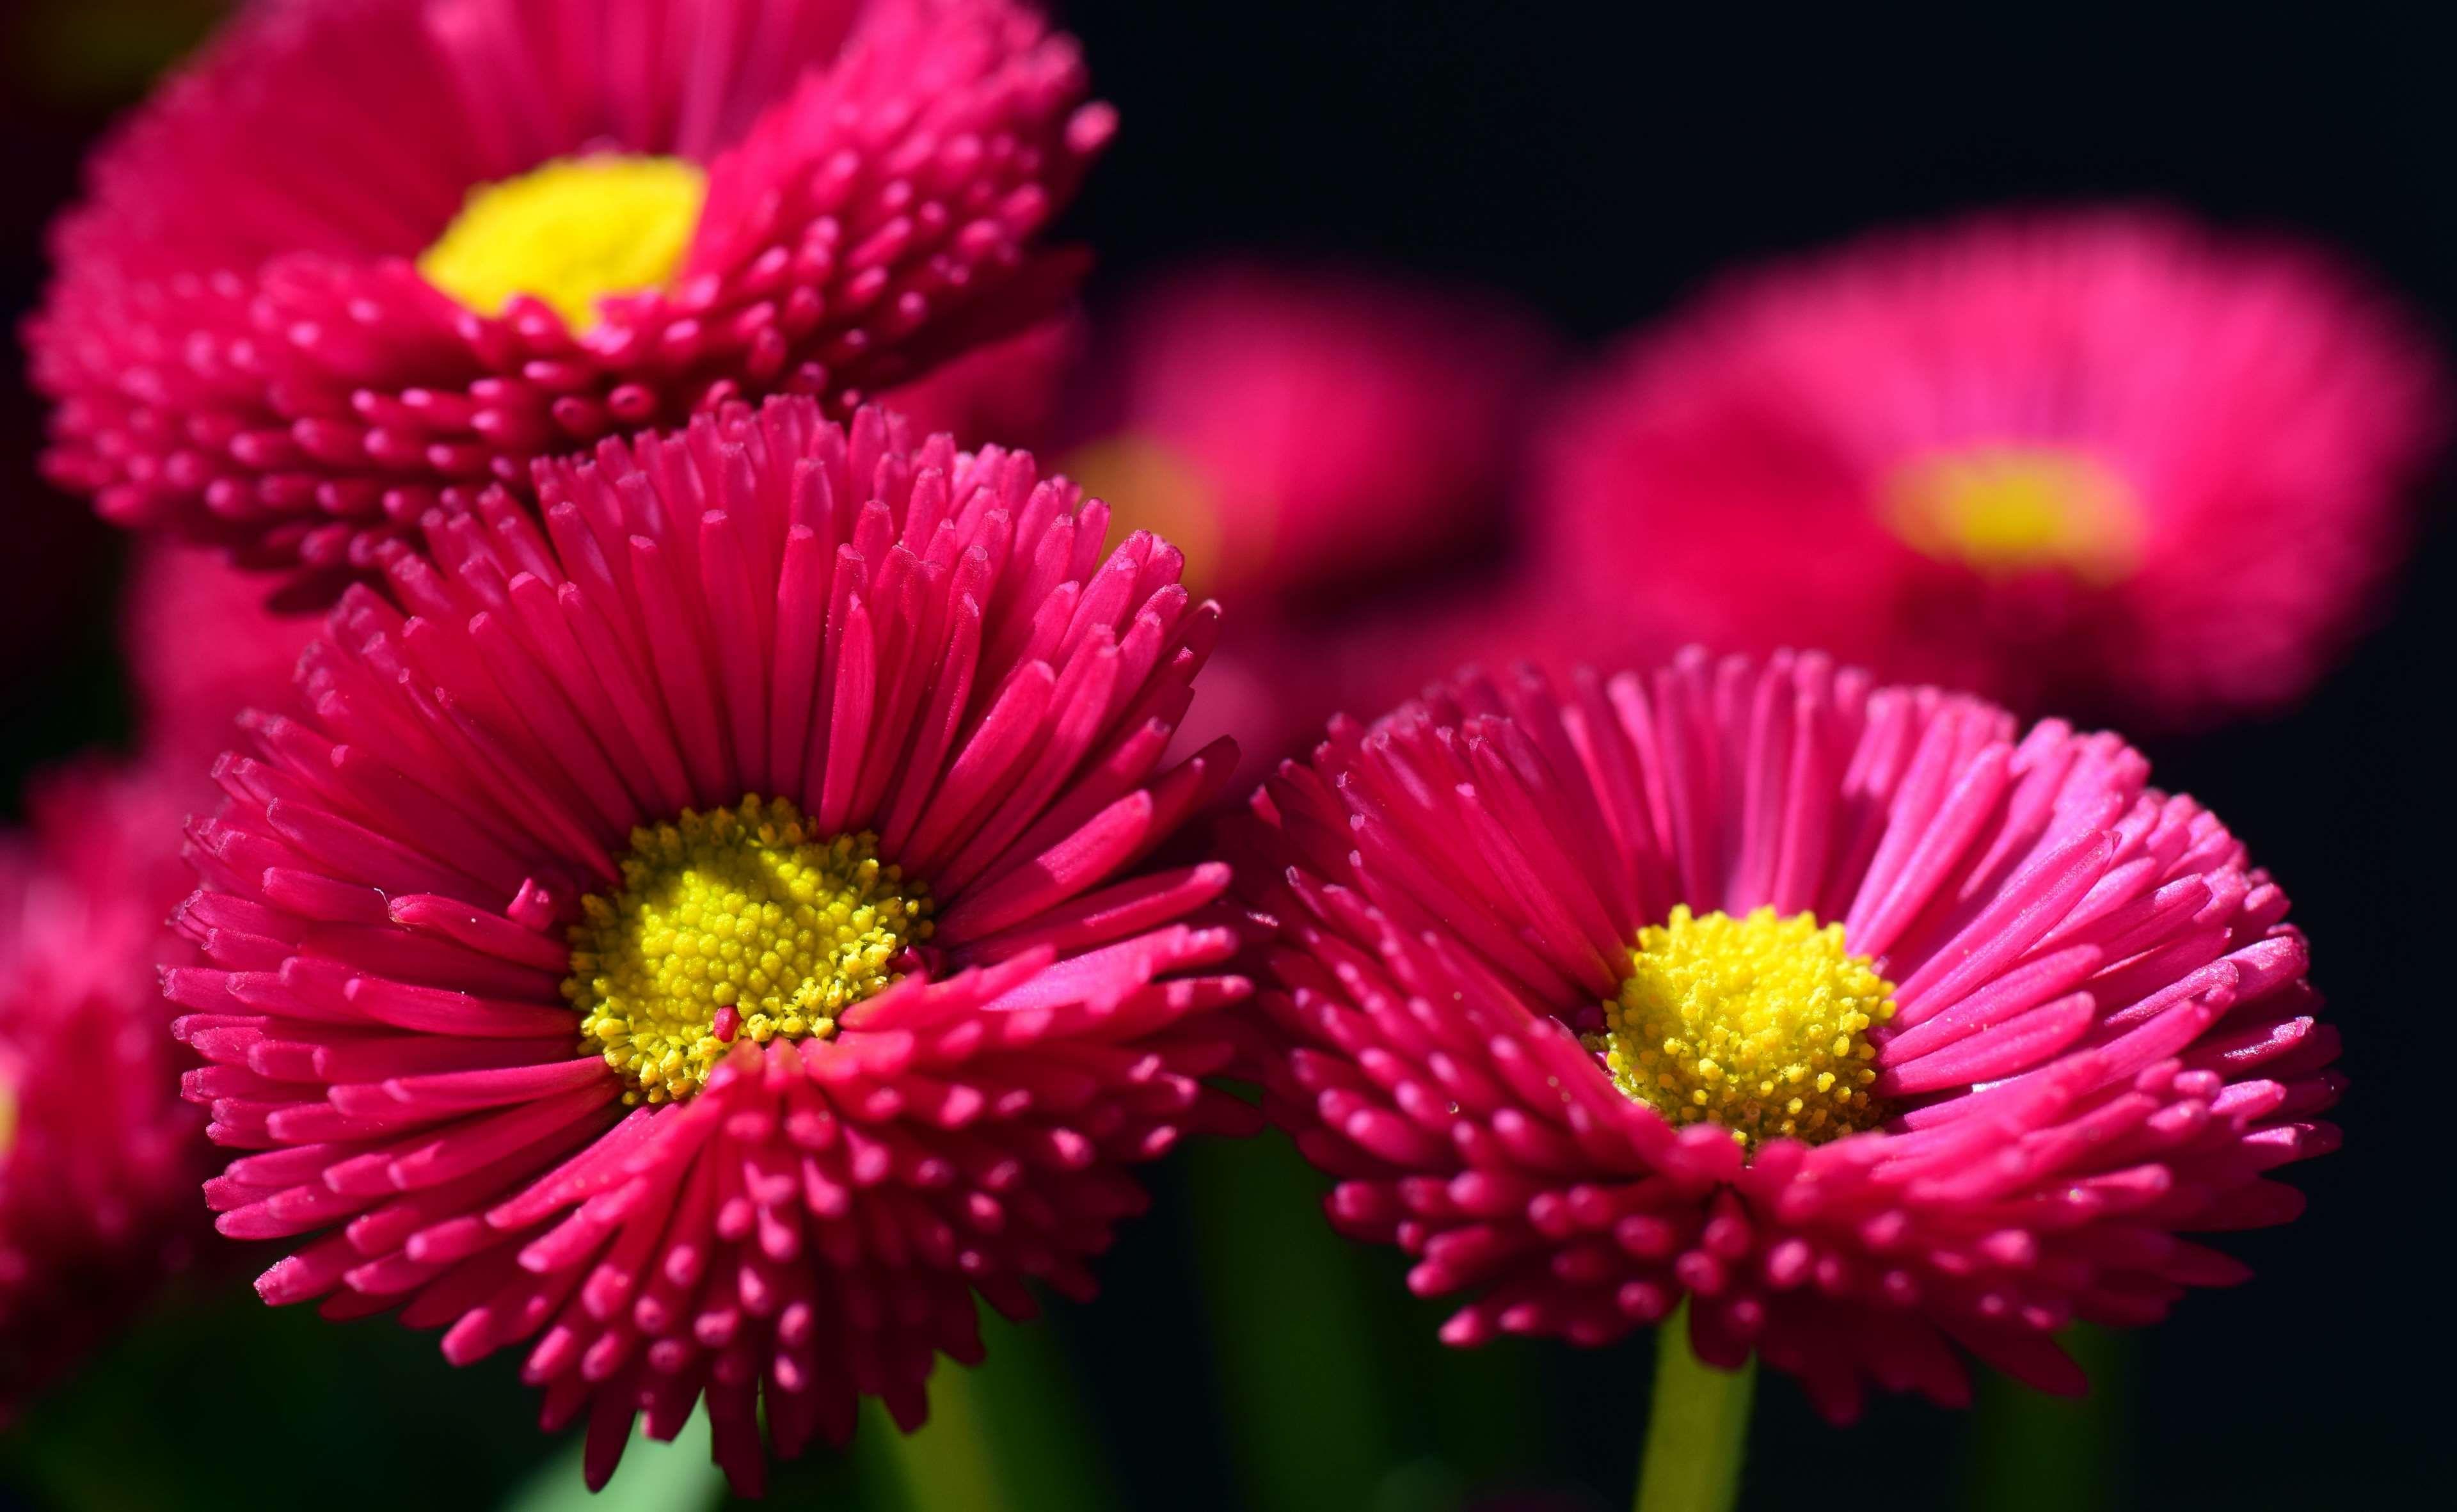 bloom #blossom #bright #close #color #colorful #composites #cultivar ...